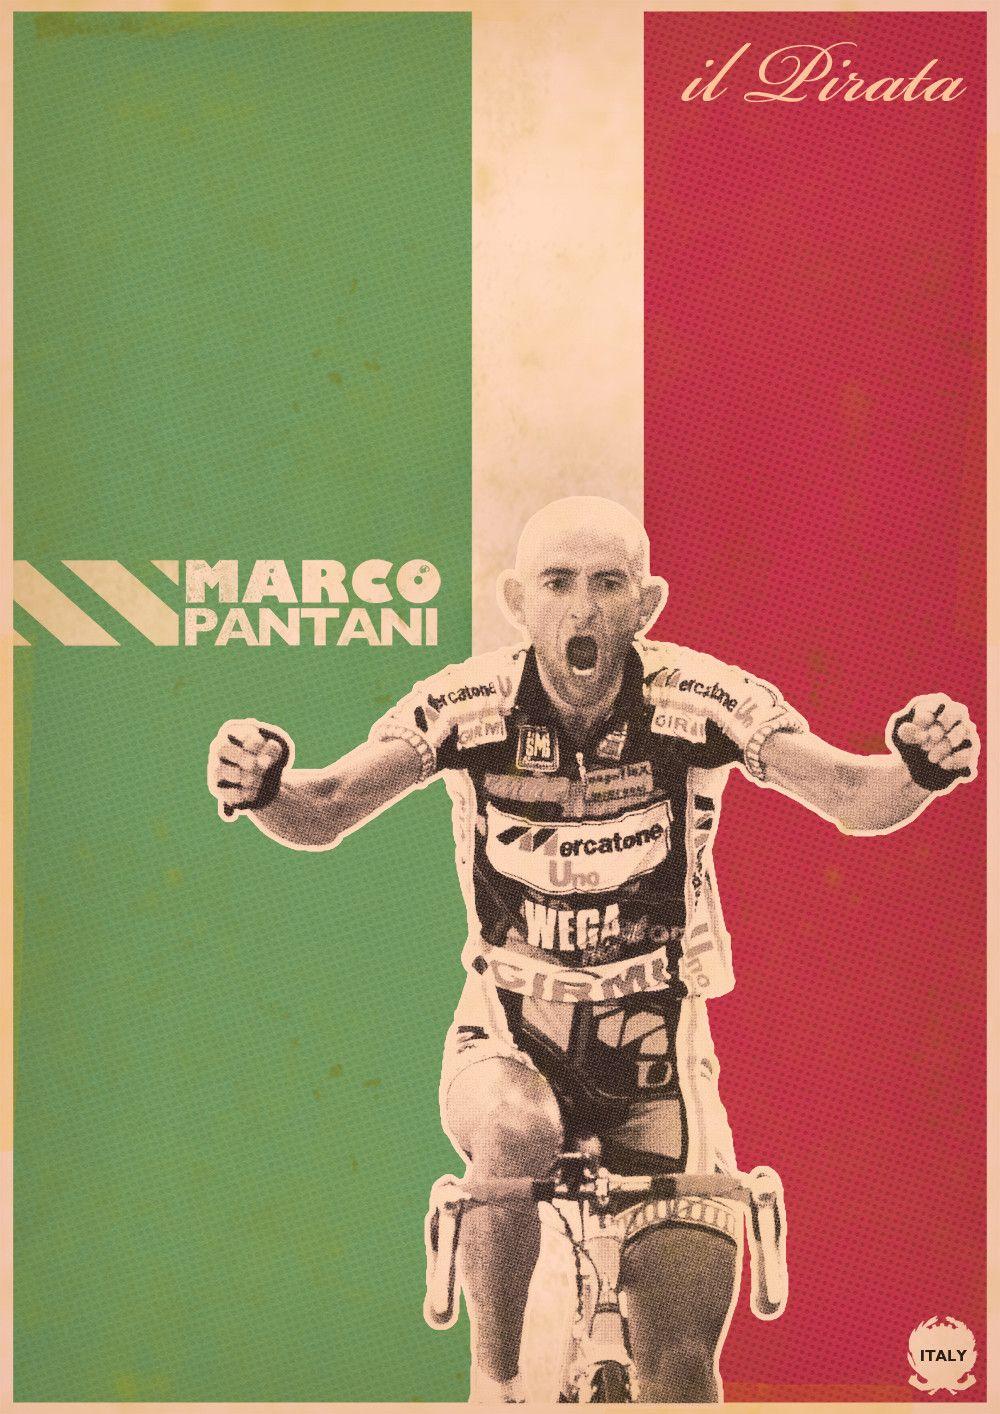 MARCO PANTANI GIRO D/'ITALIA CHAMPION SIGNED POSTER